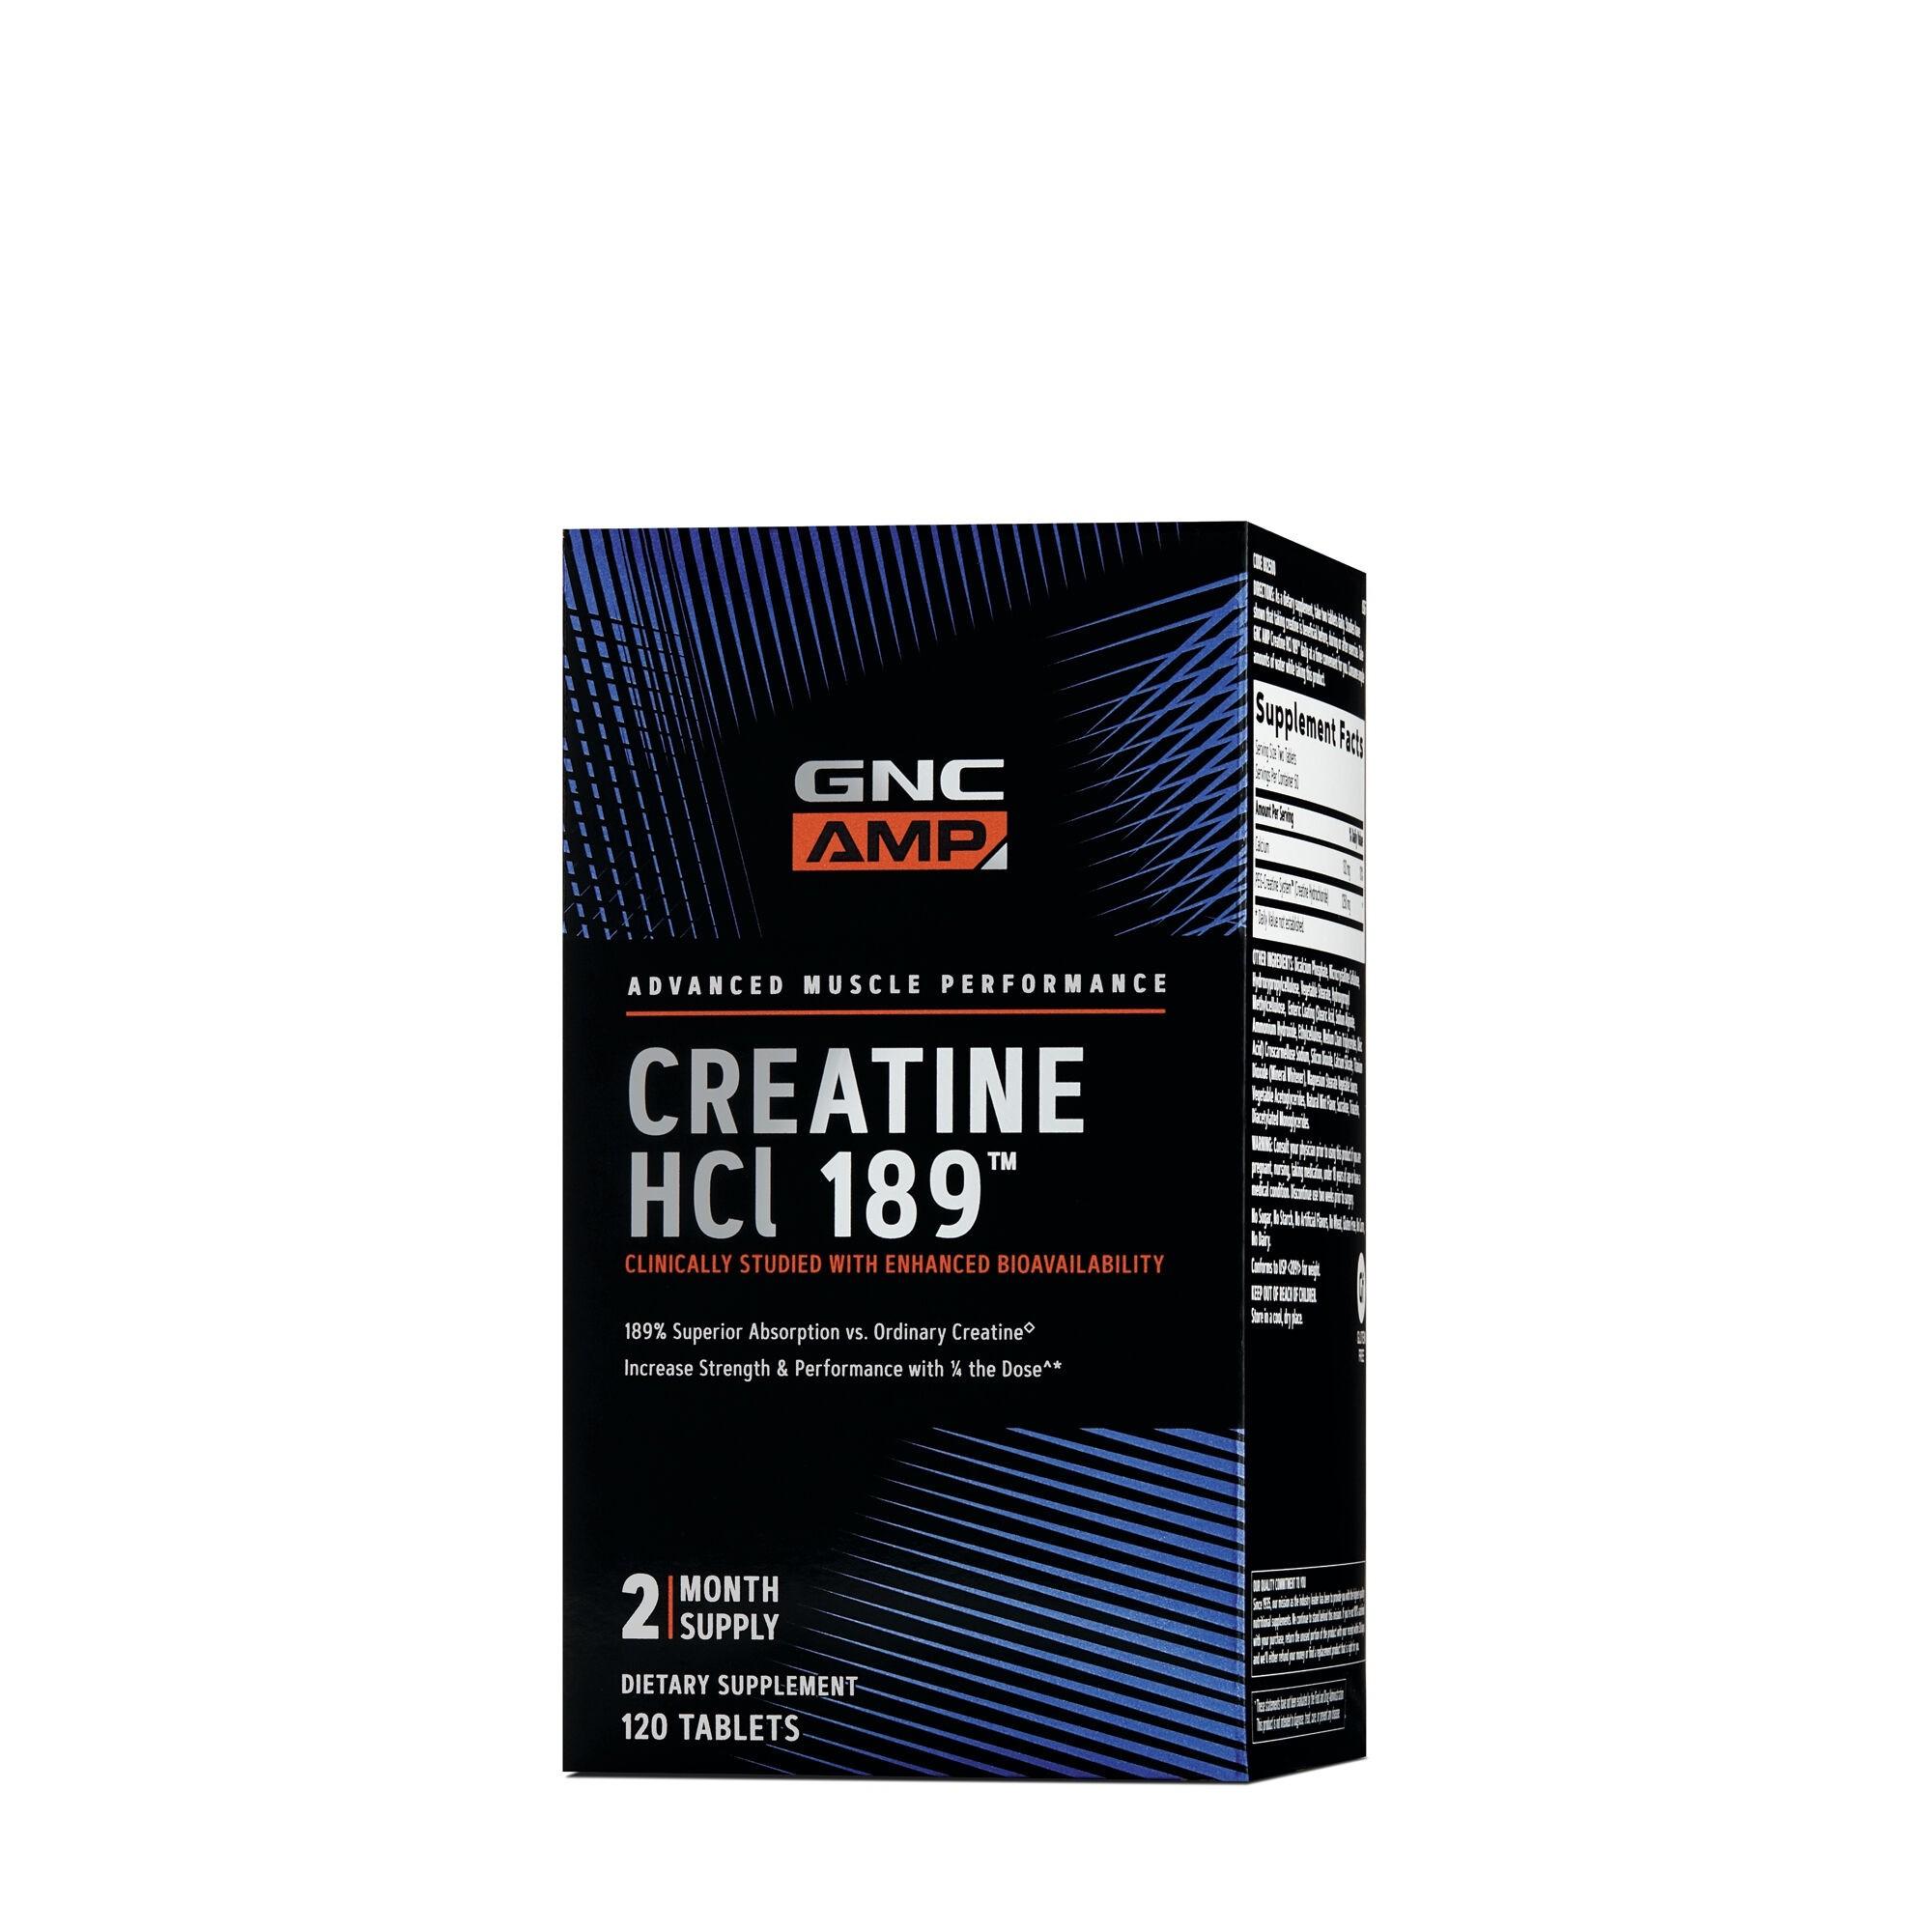 GNC AMP Creatine HCl 189™, Creatina, 120 tb